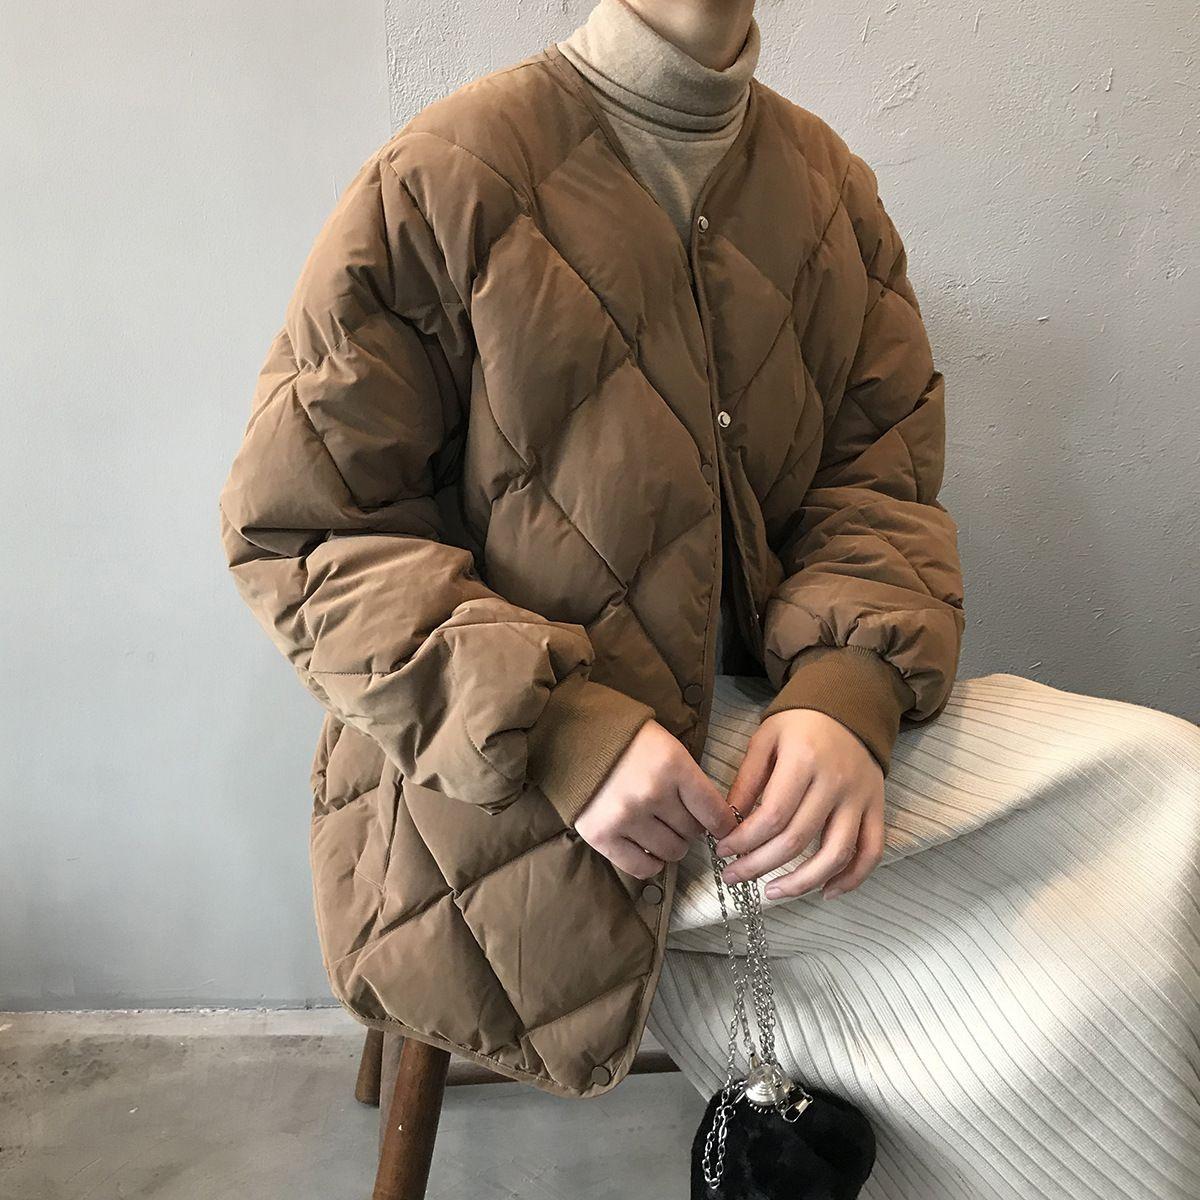 HXJJP Women Winter Coat Korean Version Cotton Outerwear Women Diamond-shaped Plaid Loose Warm Jackets Clothing Female 201015